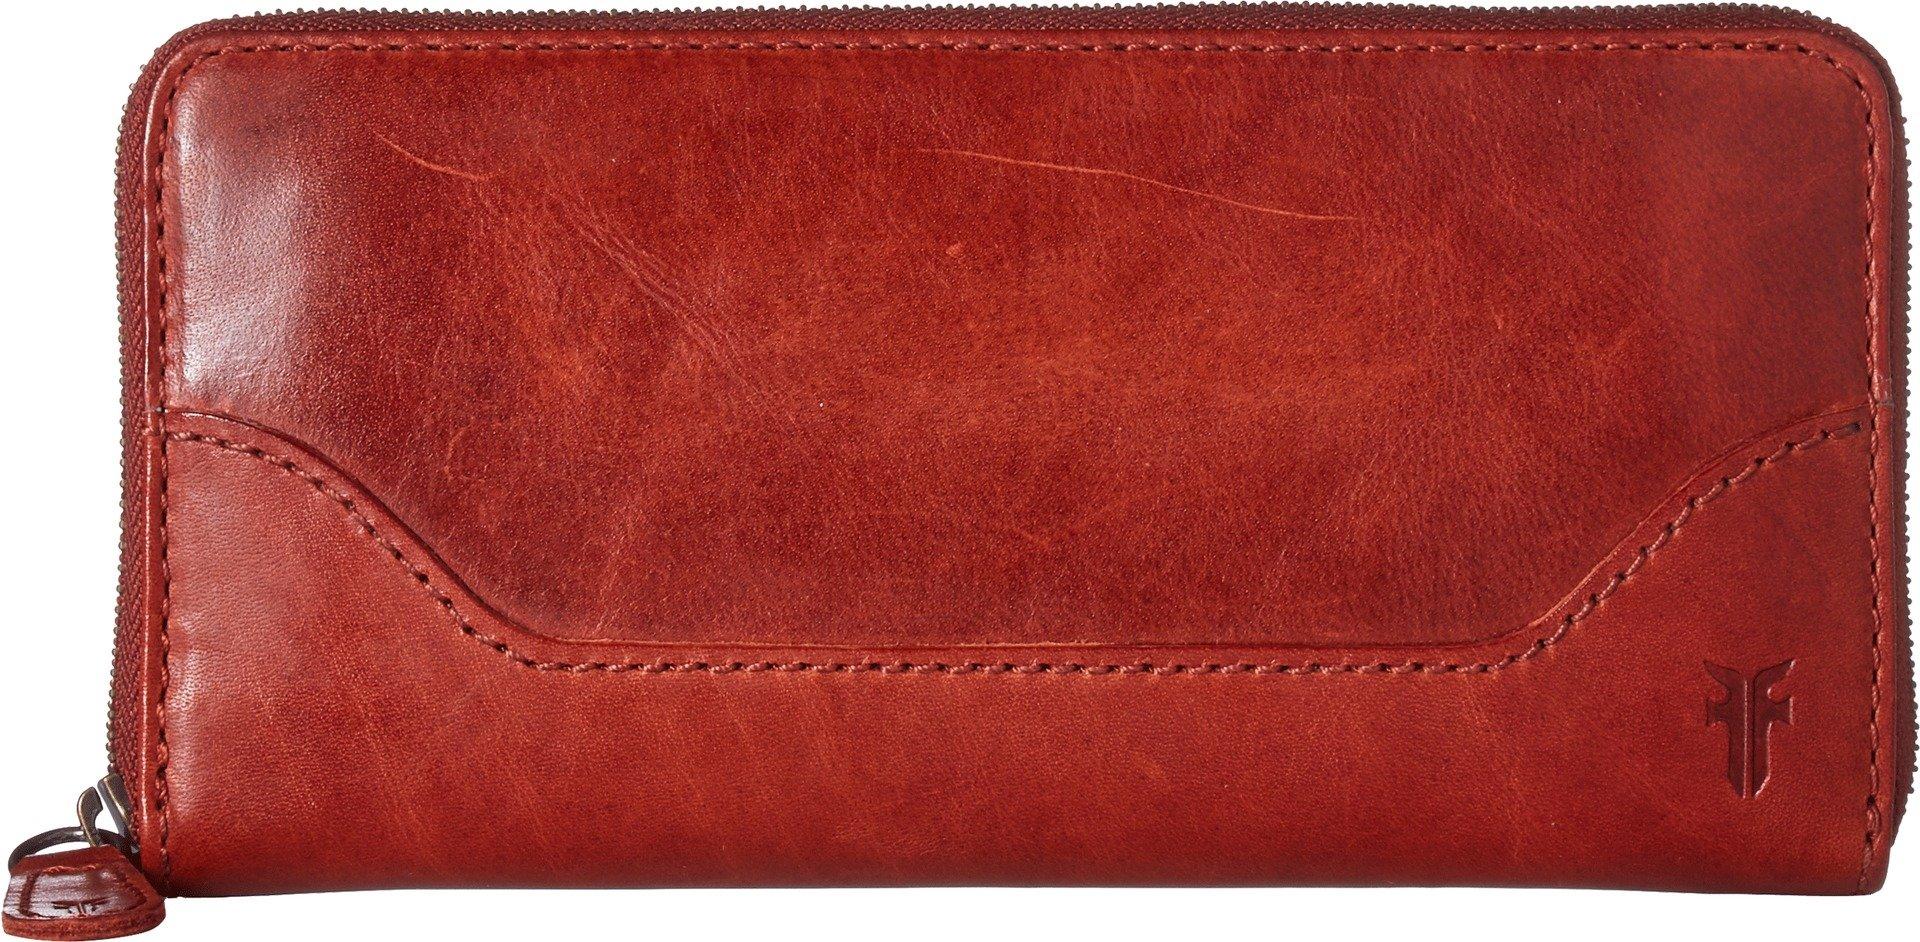 FRYE Melissa Zip Around Leather Wallet, red Clay